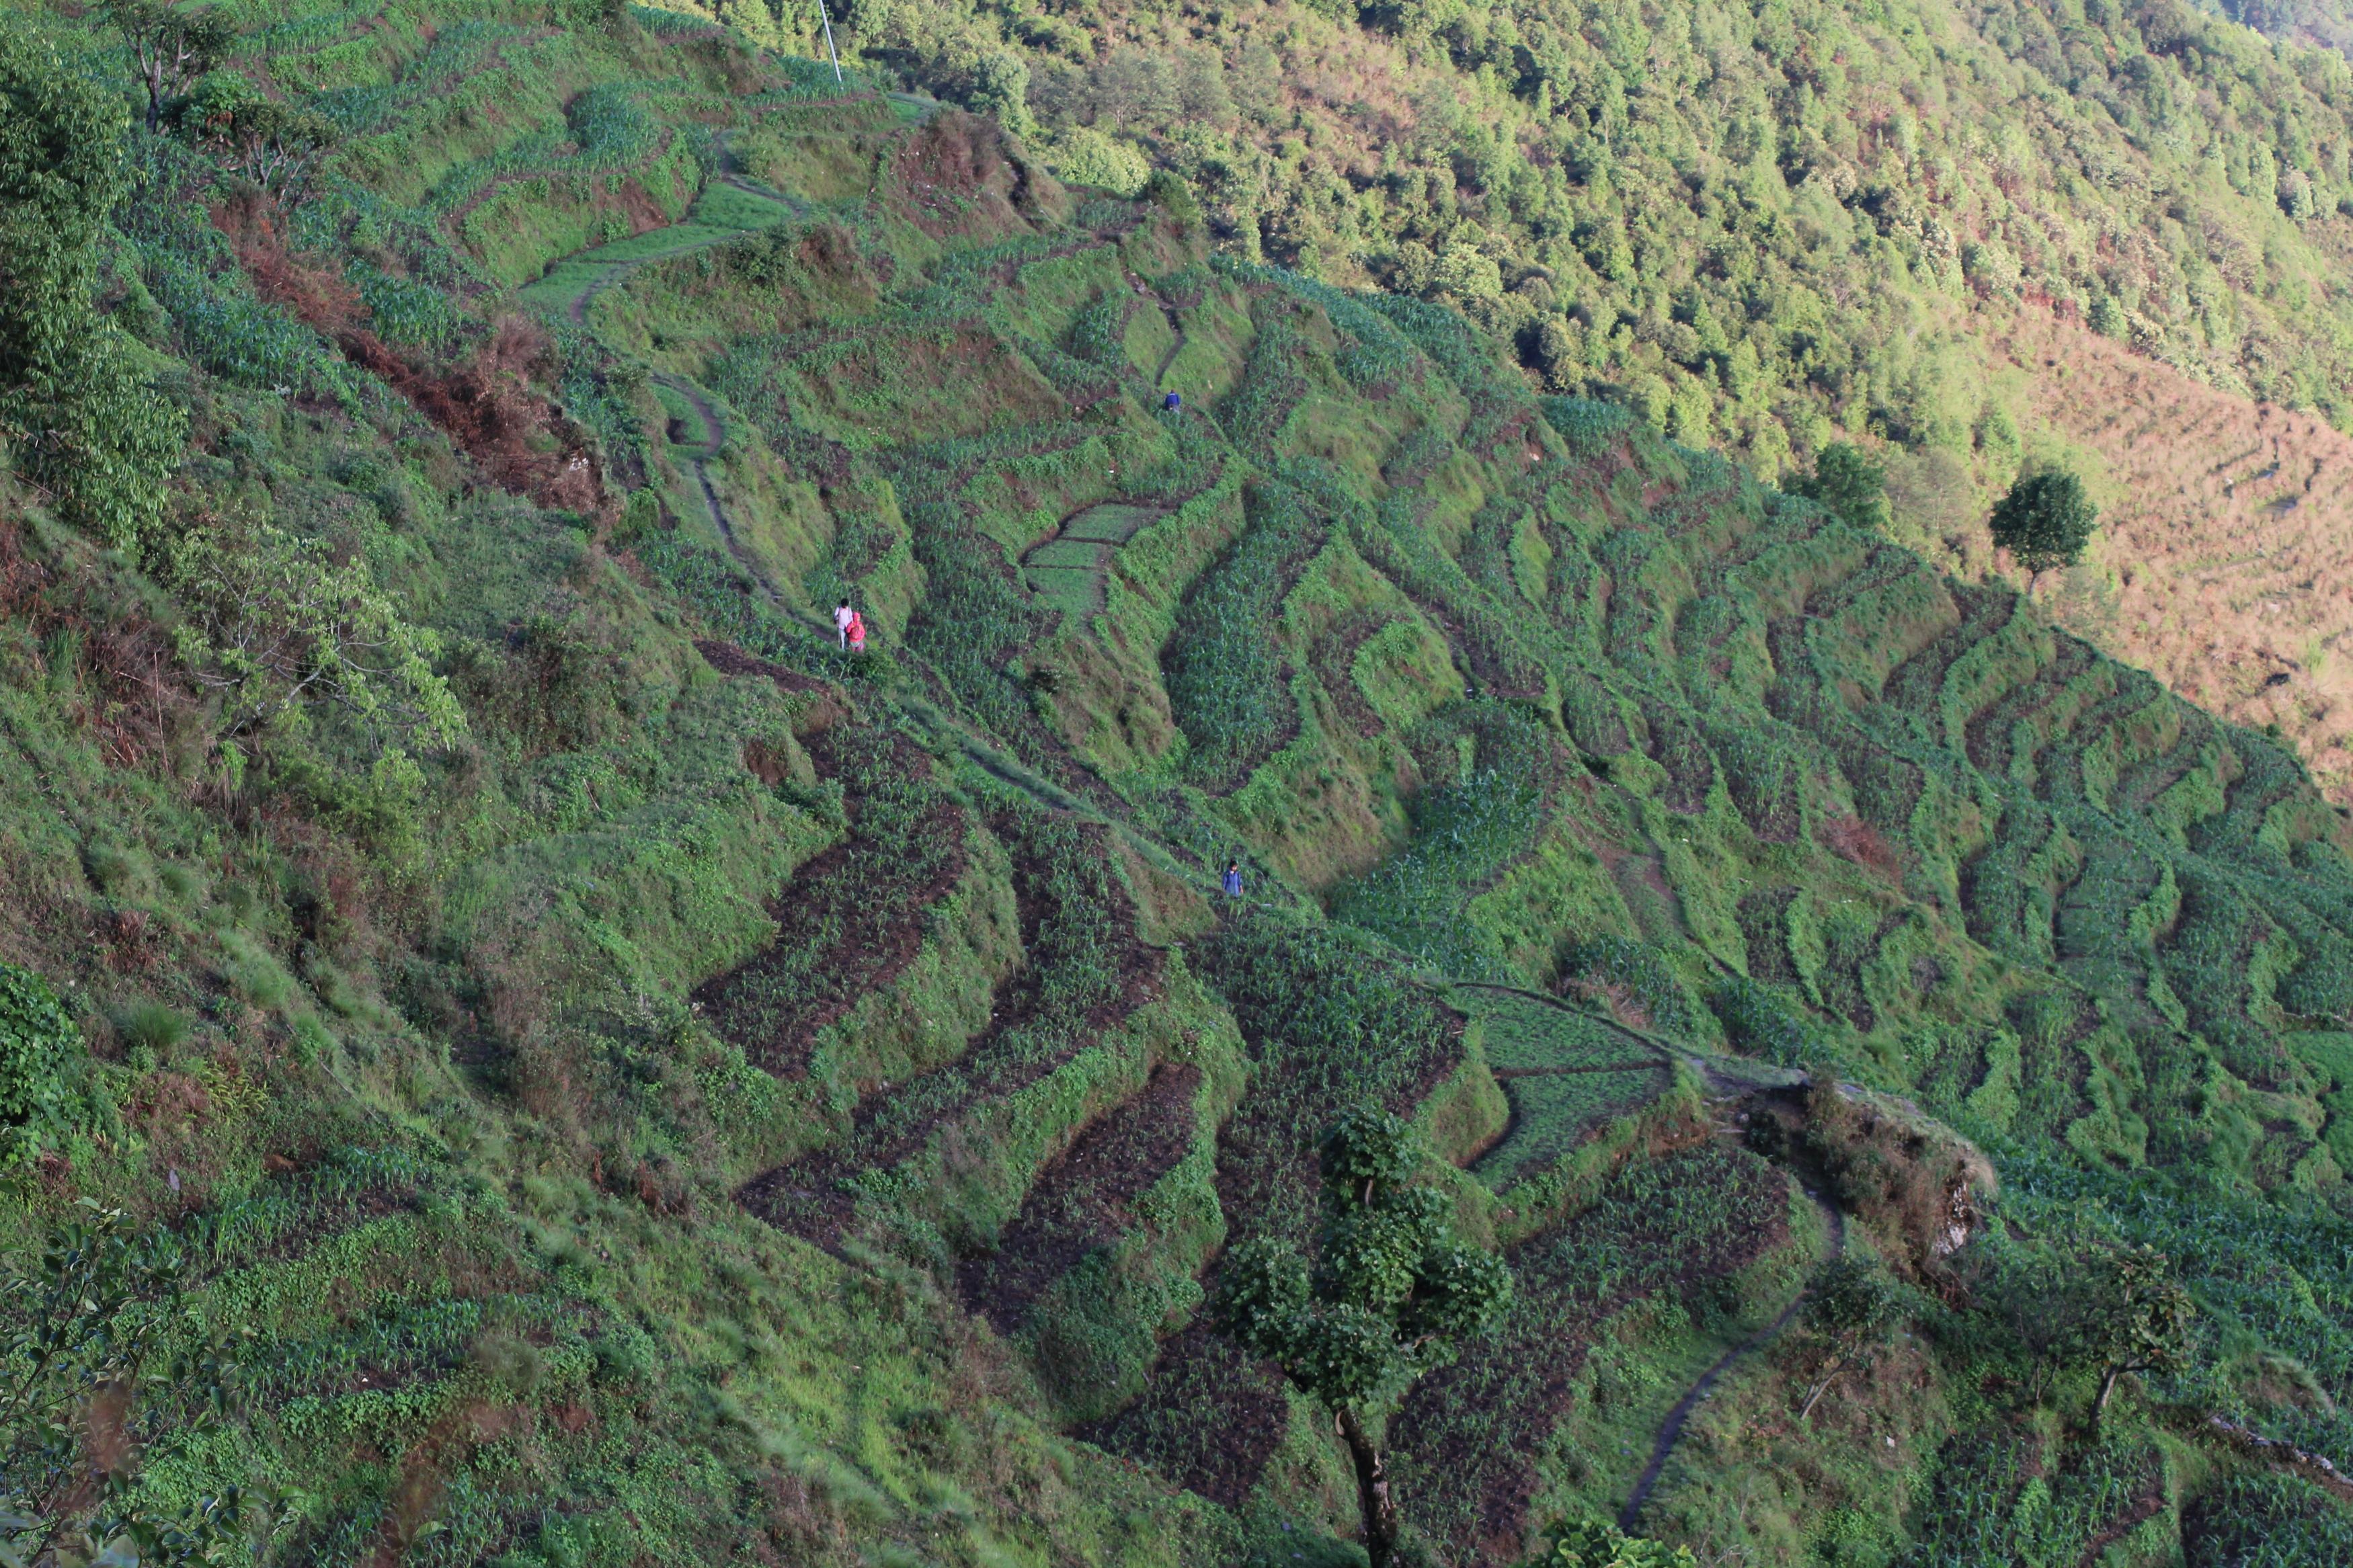 Terraced Landscape: A solution to soil erosion